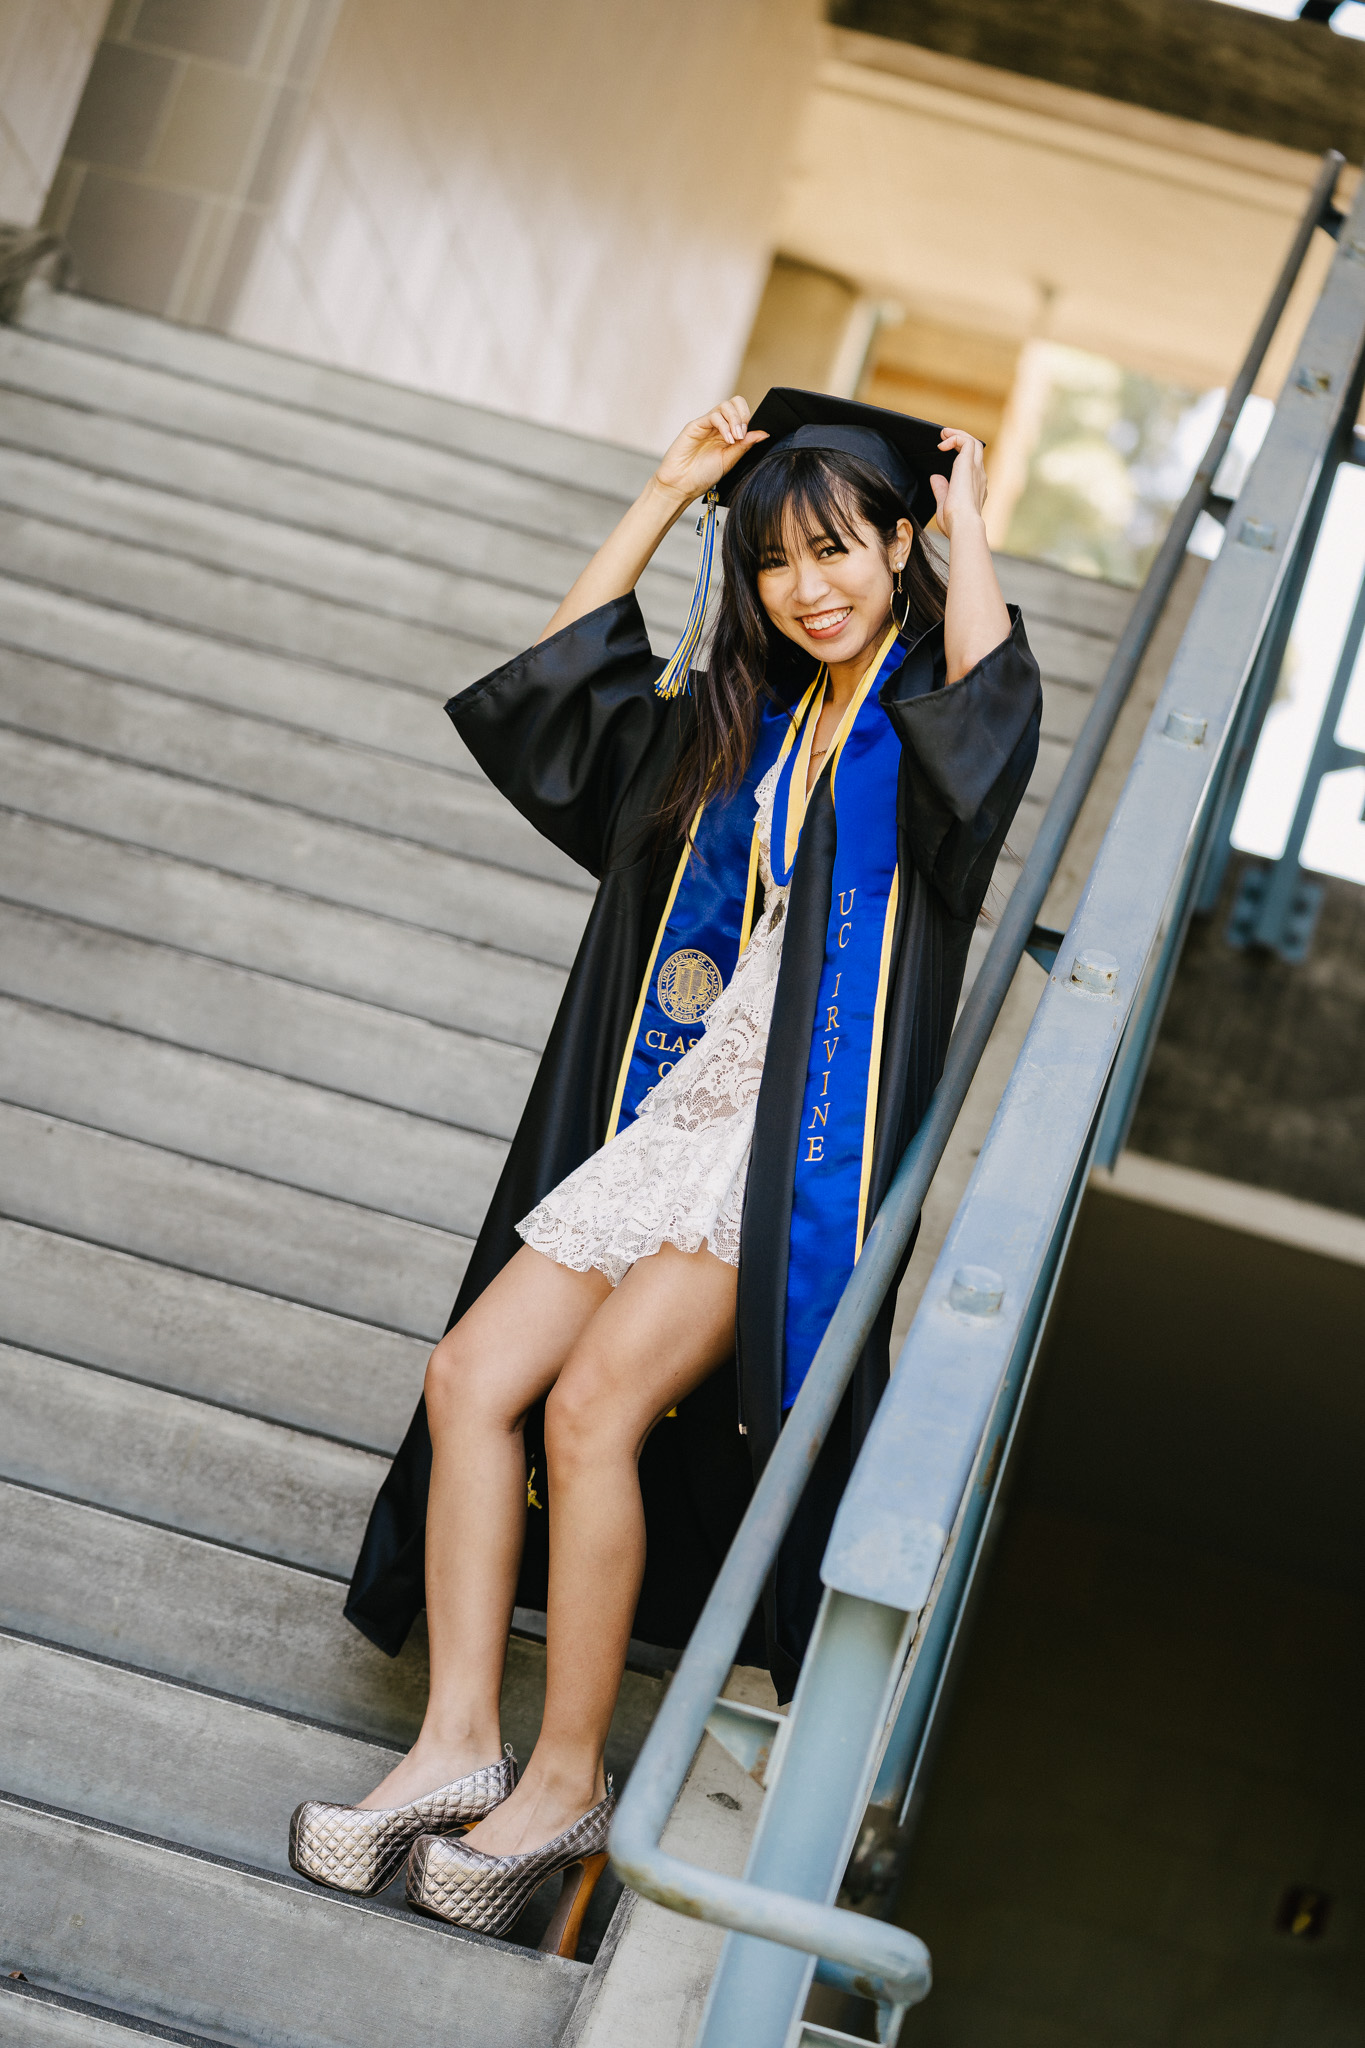 [5-16-2018] Vi's Graduation Photoshoot126.jpg